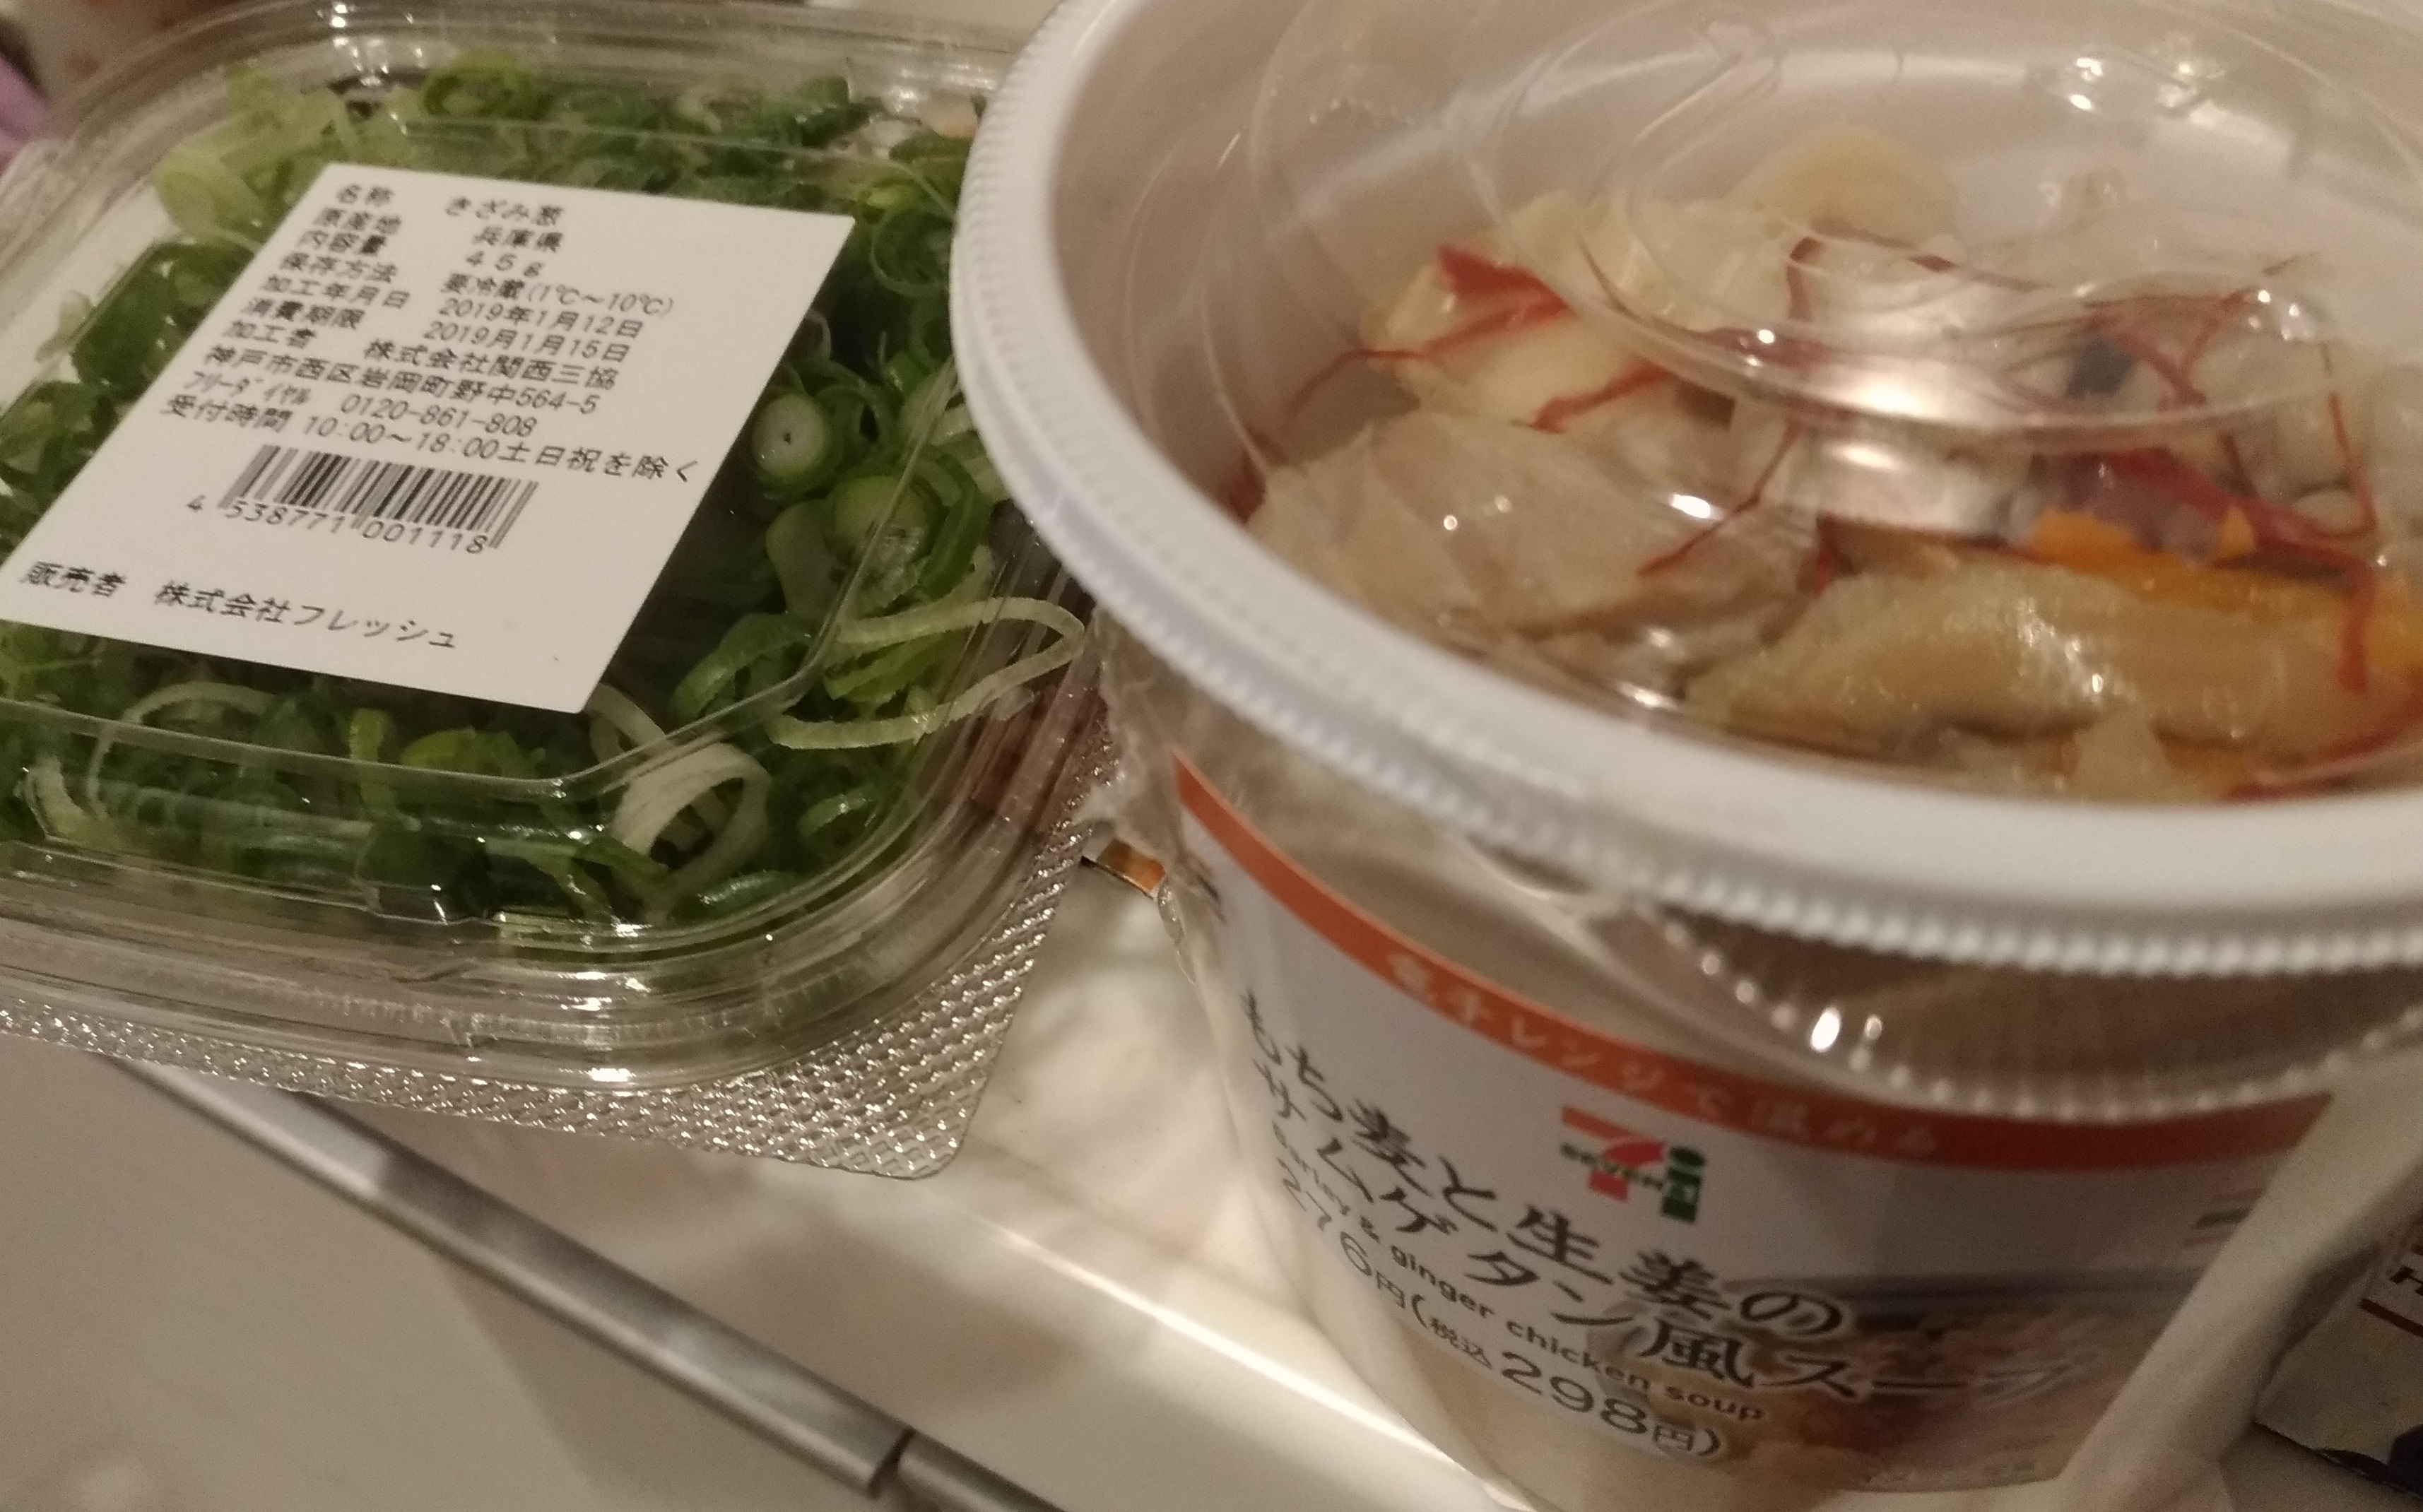 osaka_convenience_store_healthy1.jpg